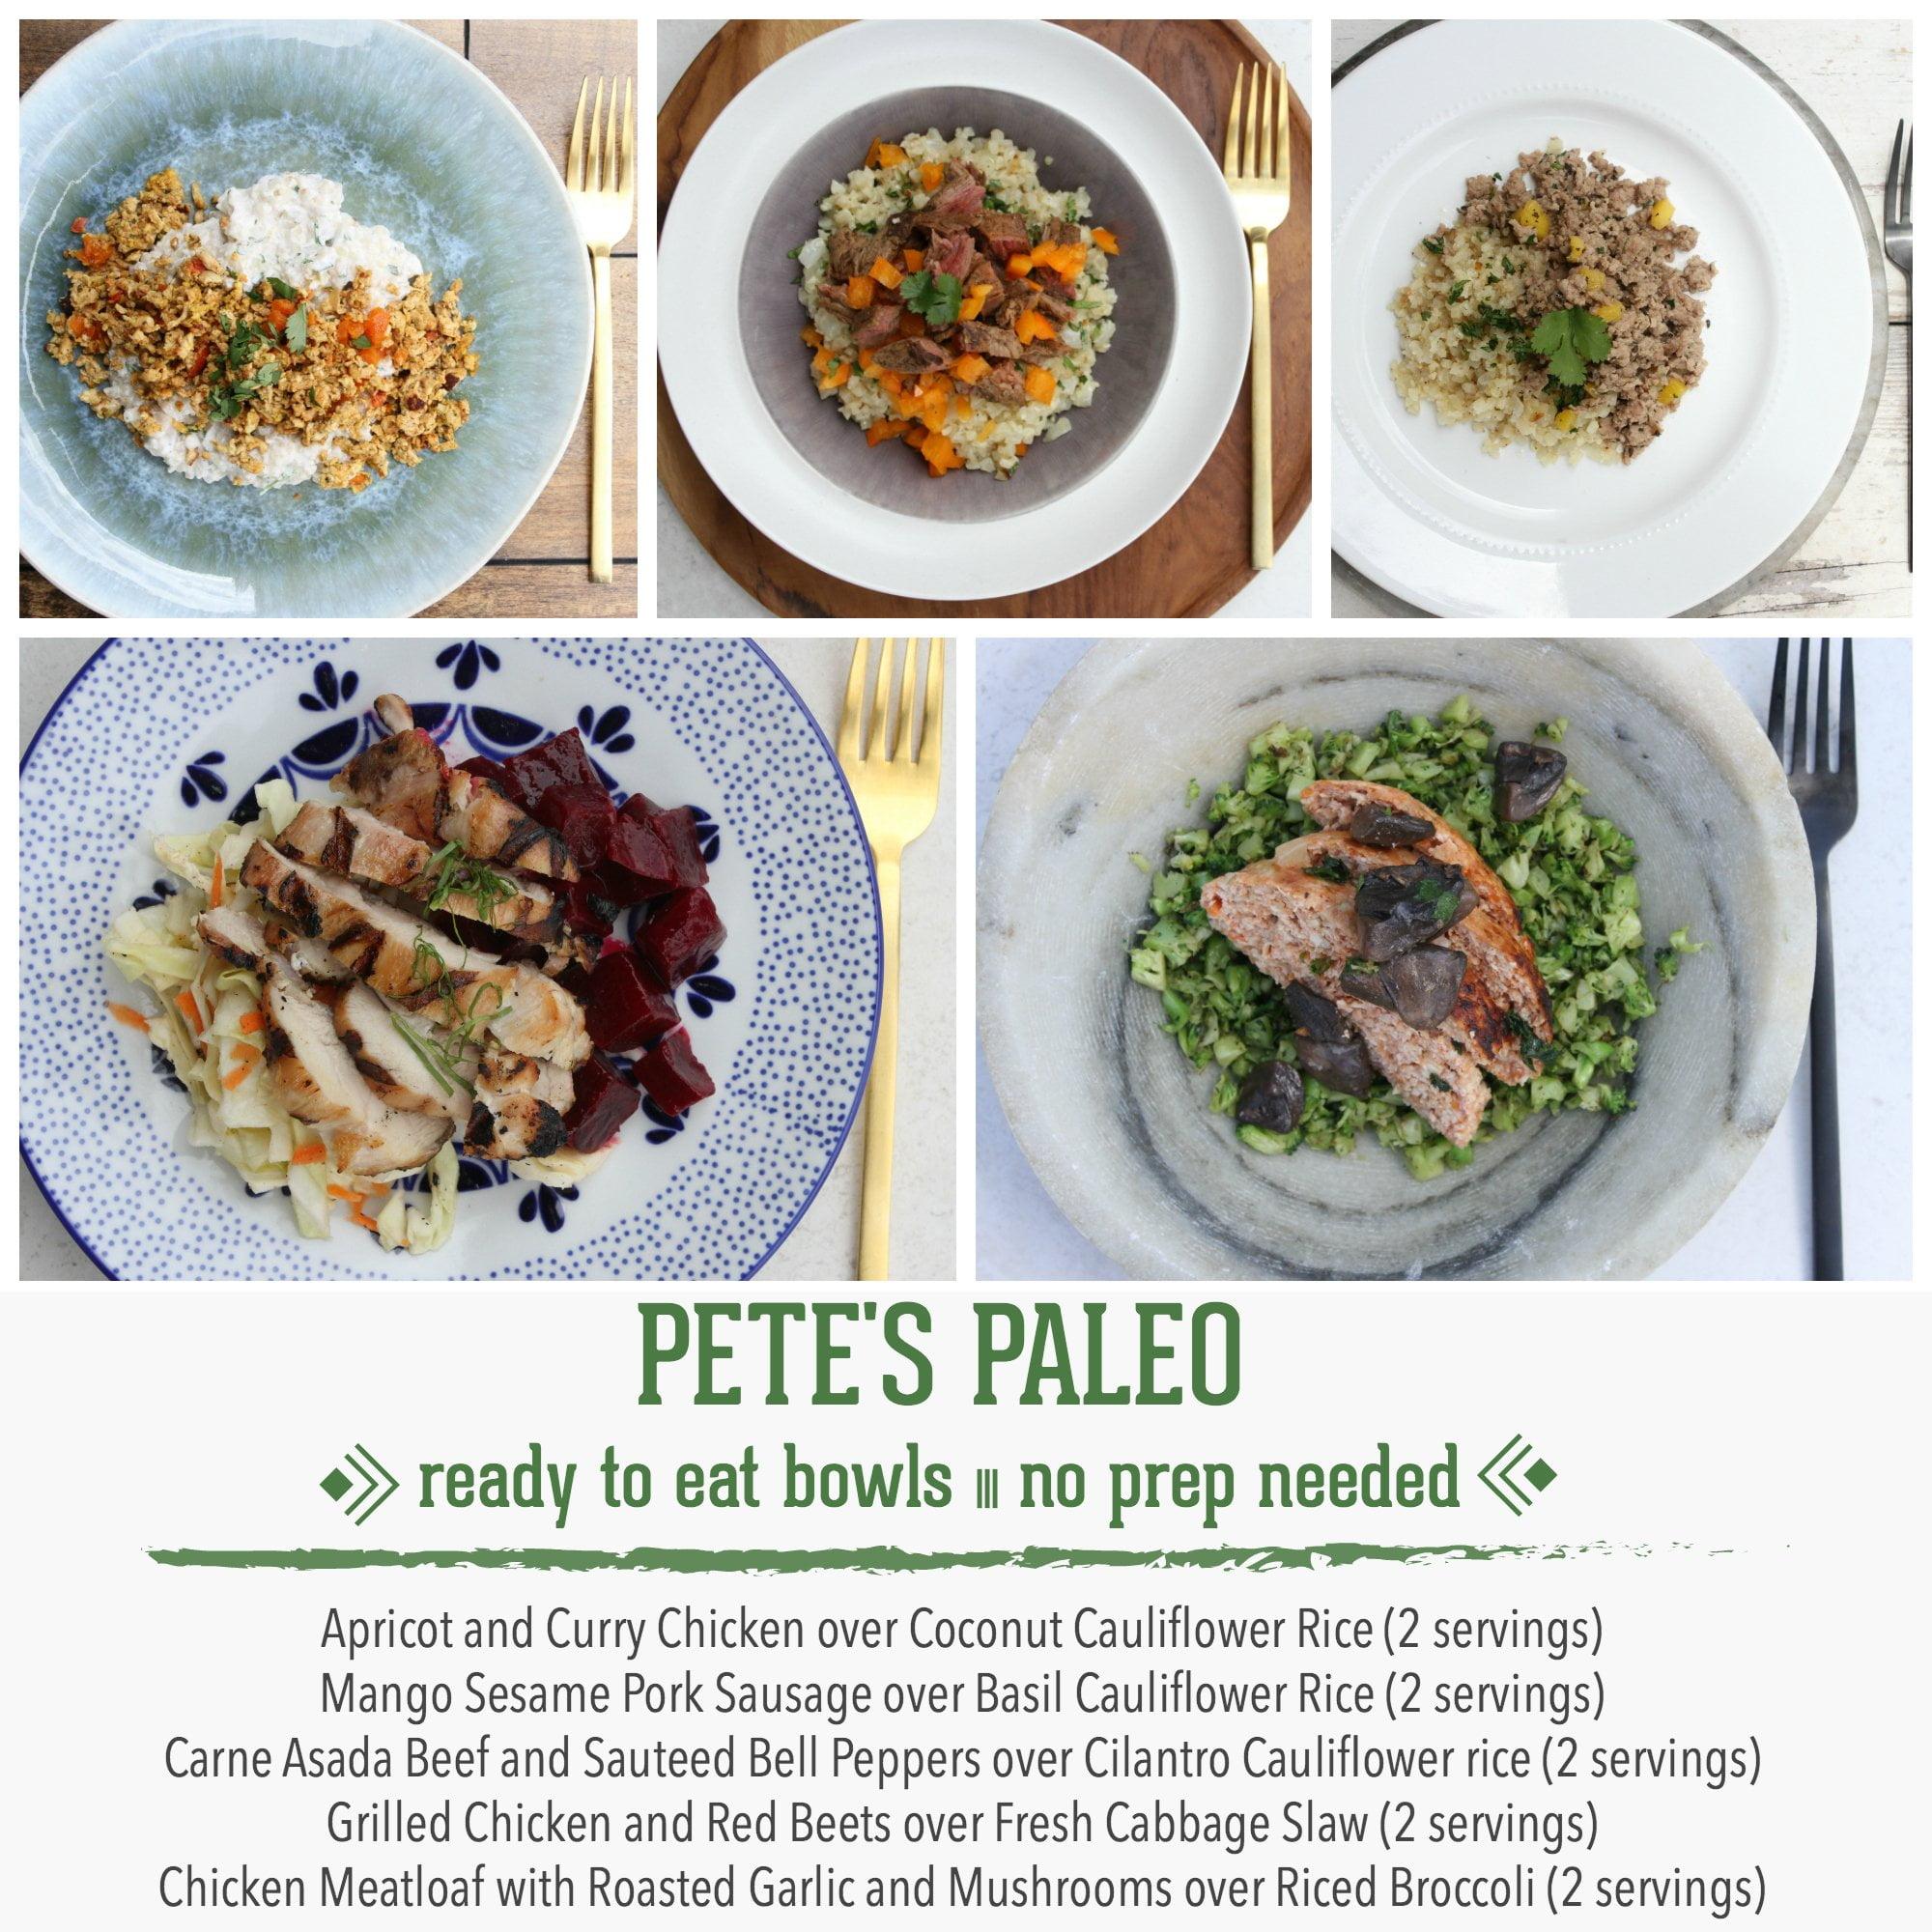 Pete's Paleo No Prep Organic Bowls, Bundle of 10 (2 Servings of Each Bowl)